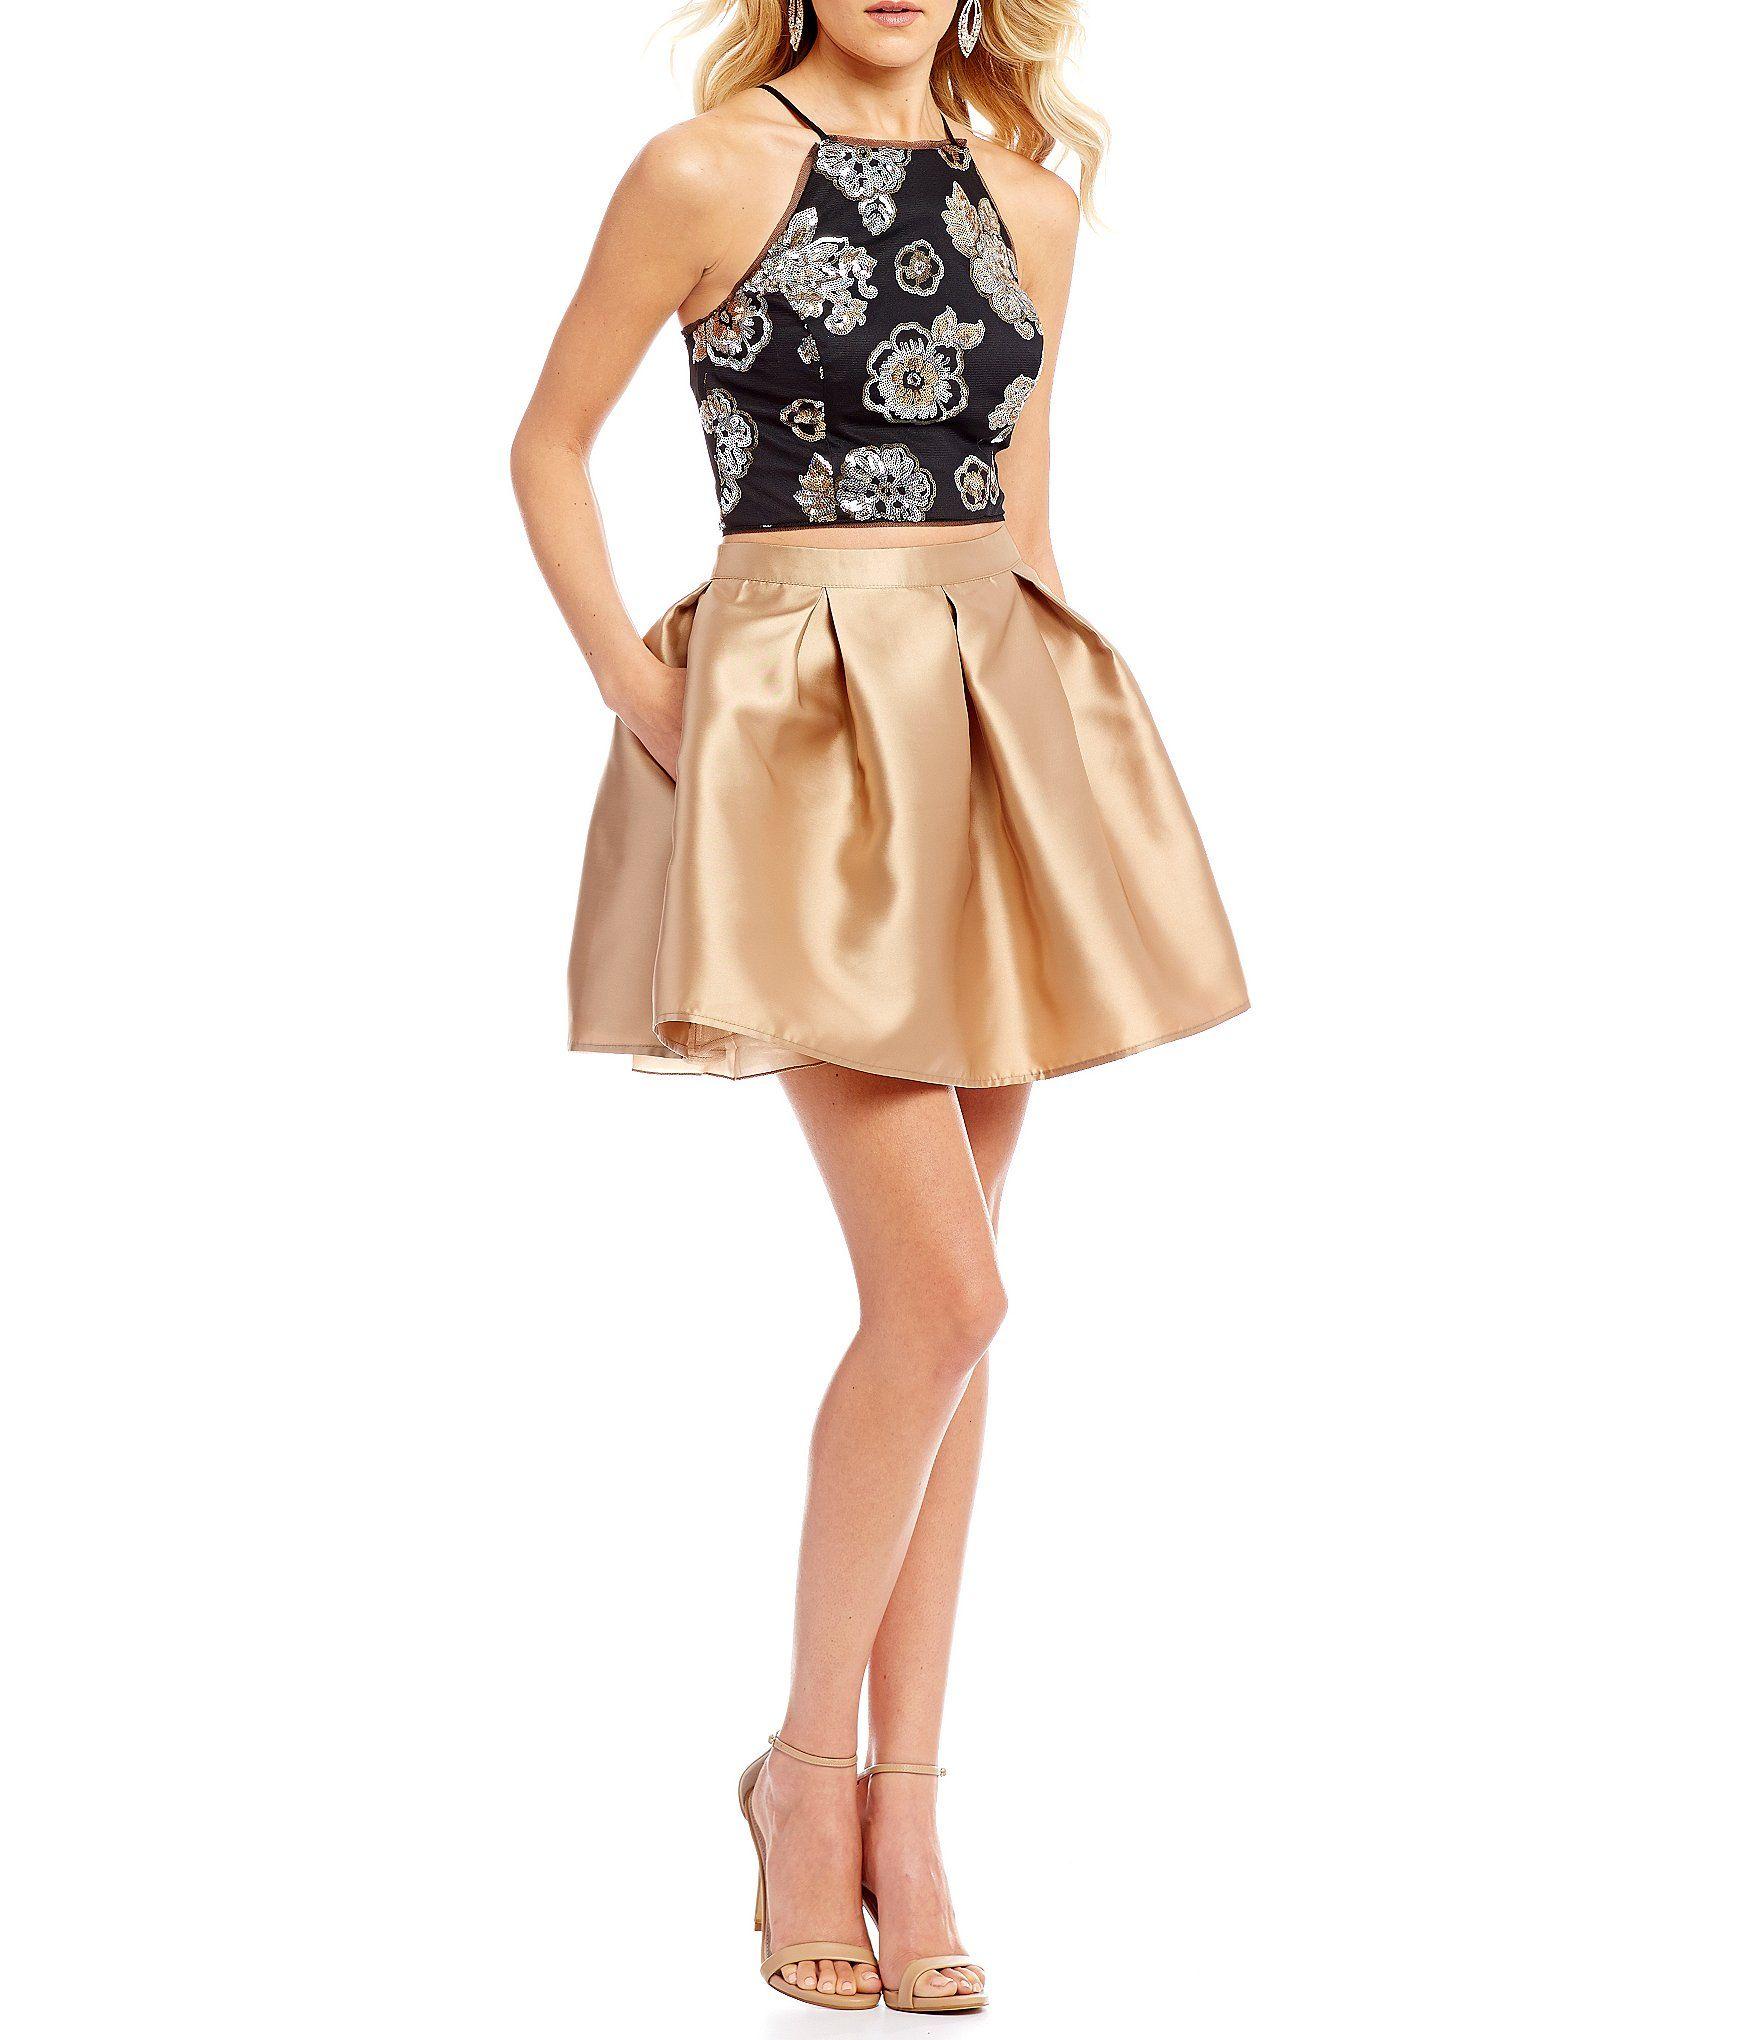 Teeze me sequin pattern top twopiece dress dillards clothing